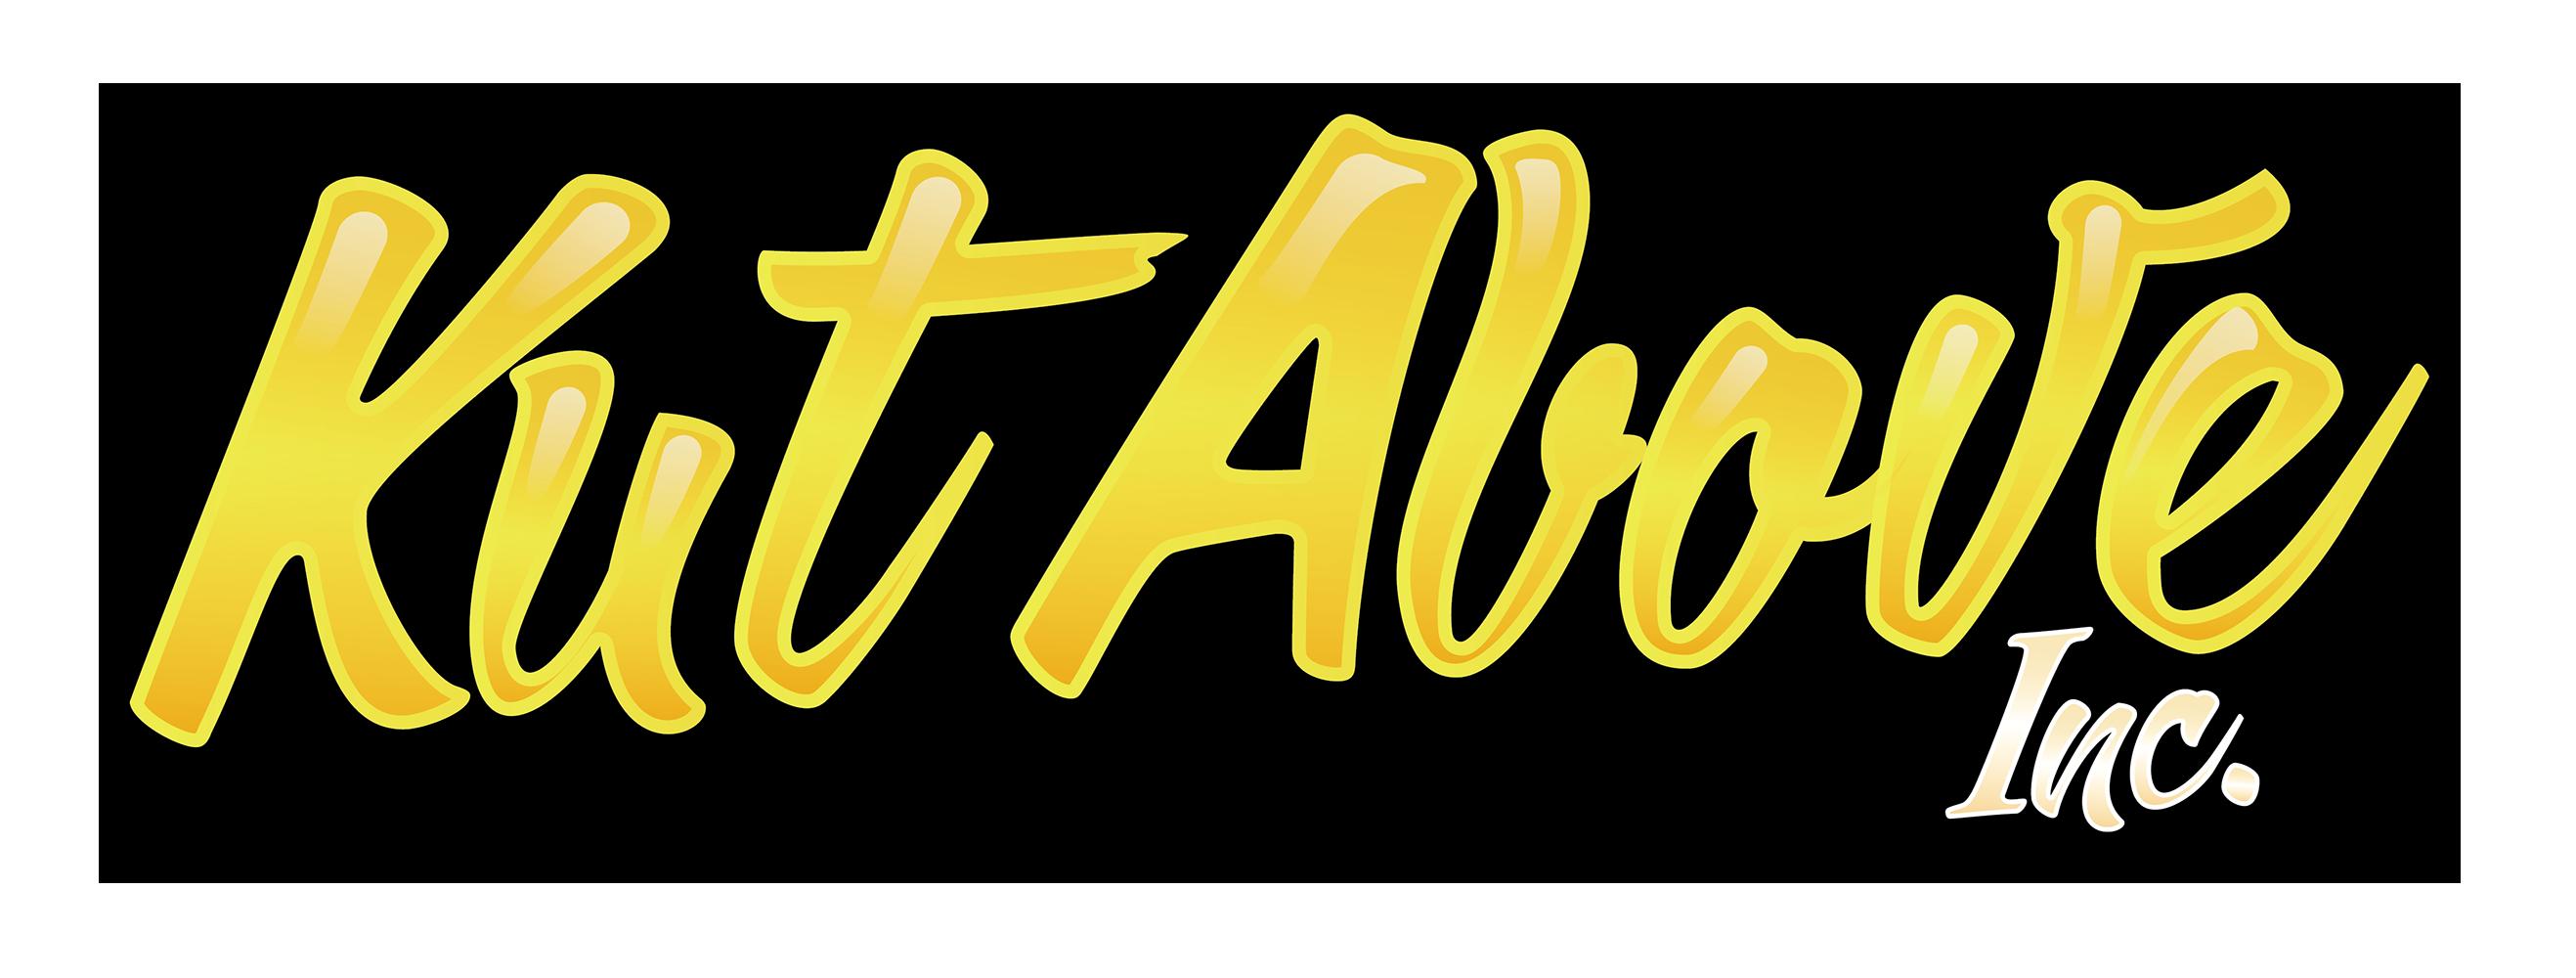 Kut above Logo-01